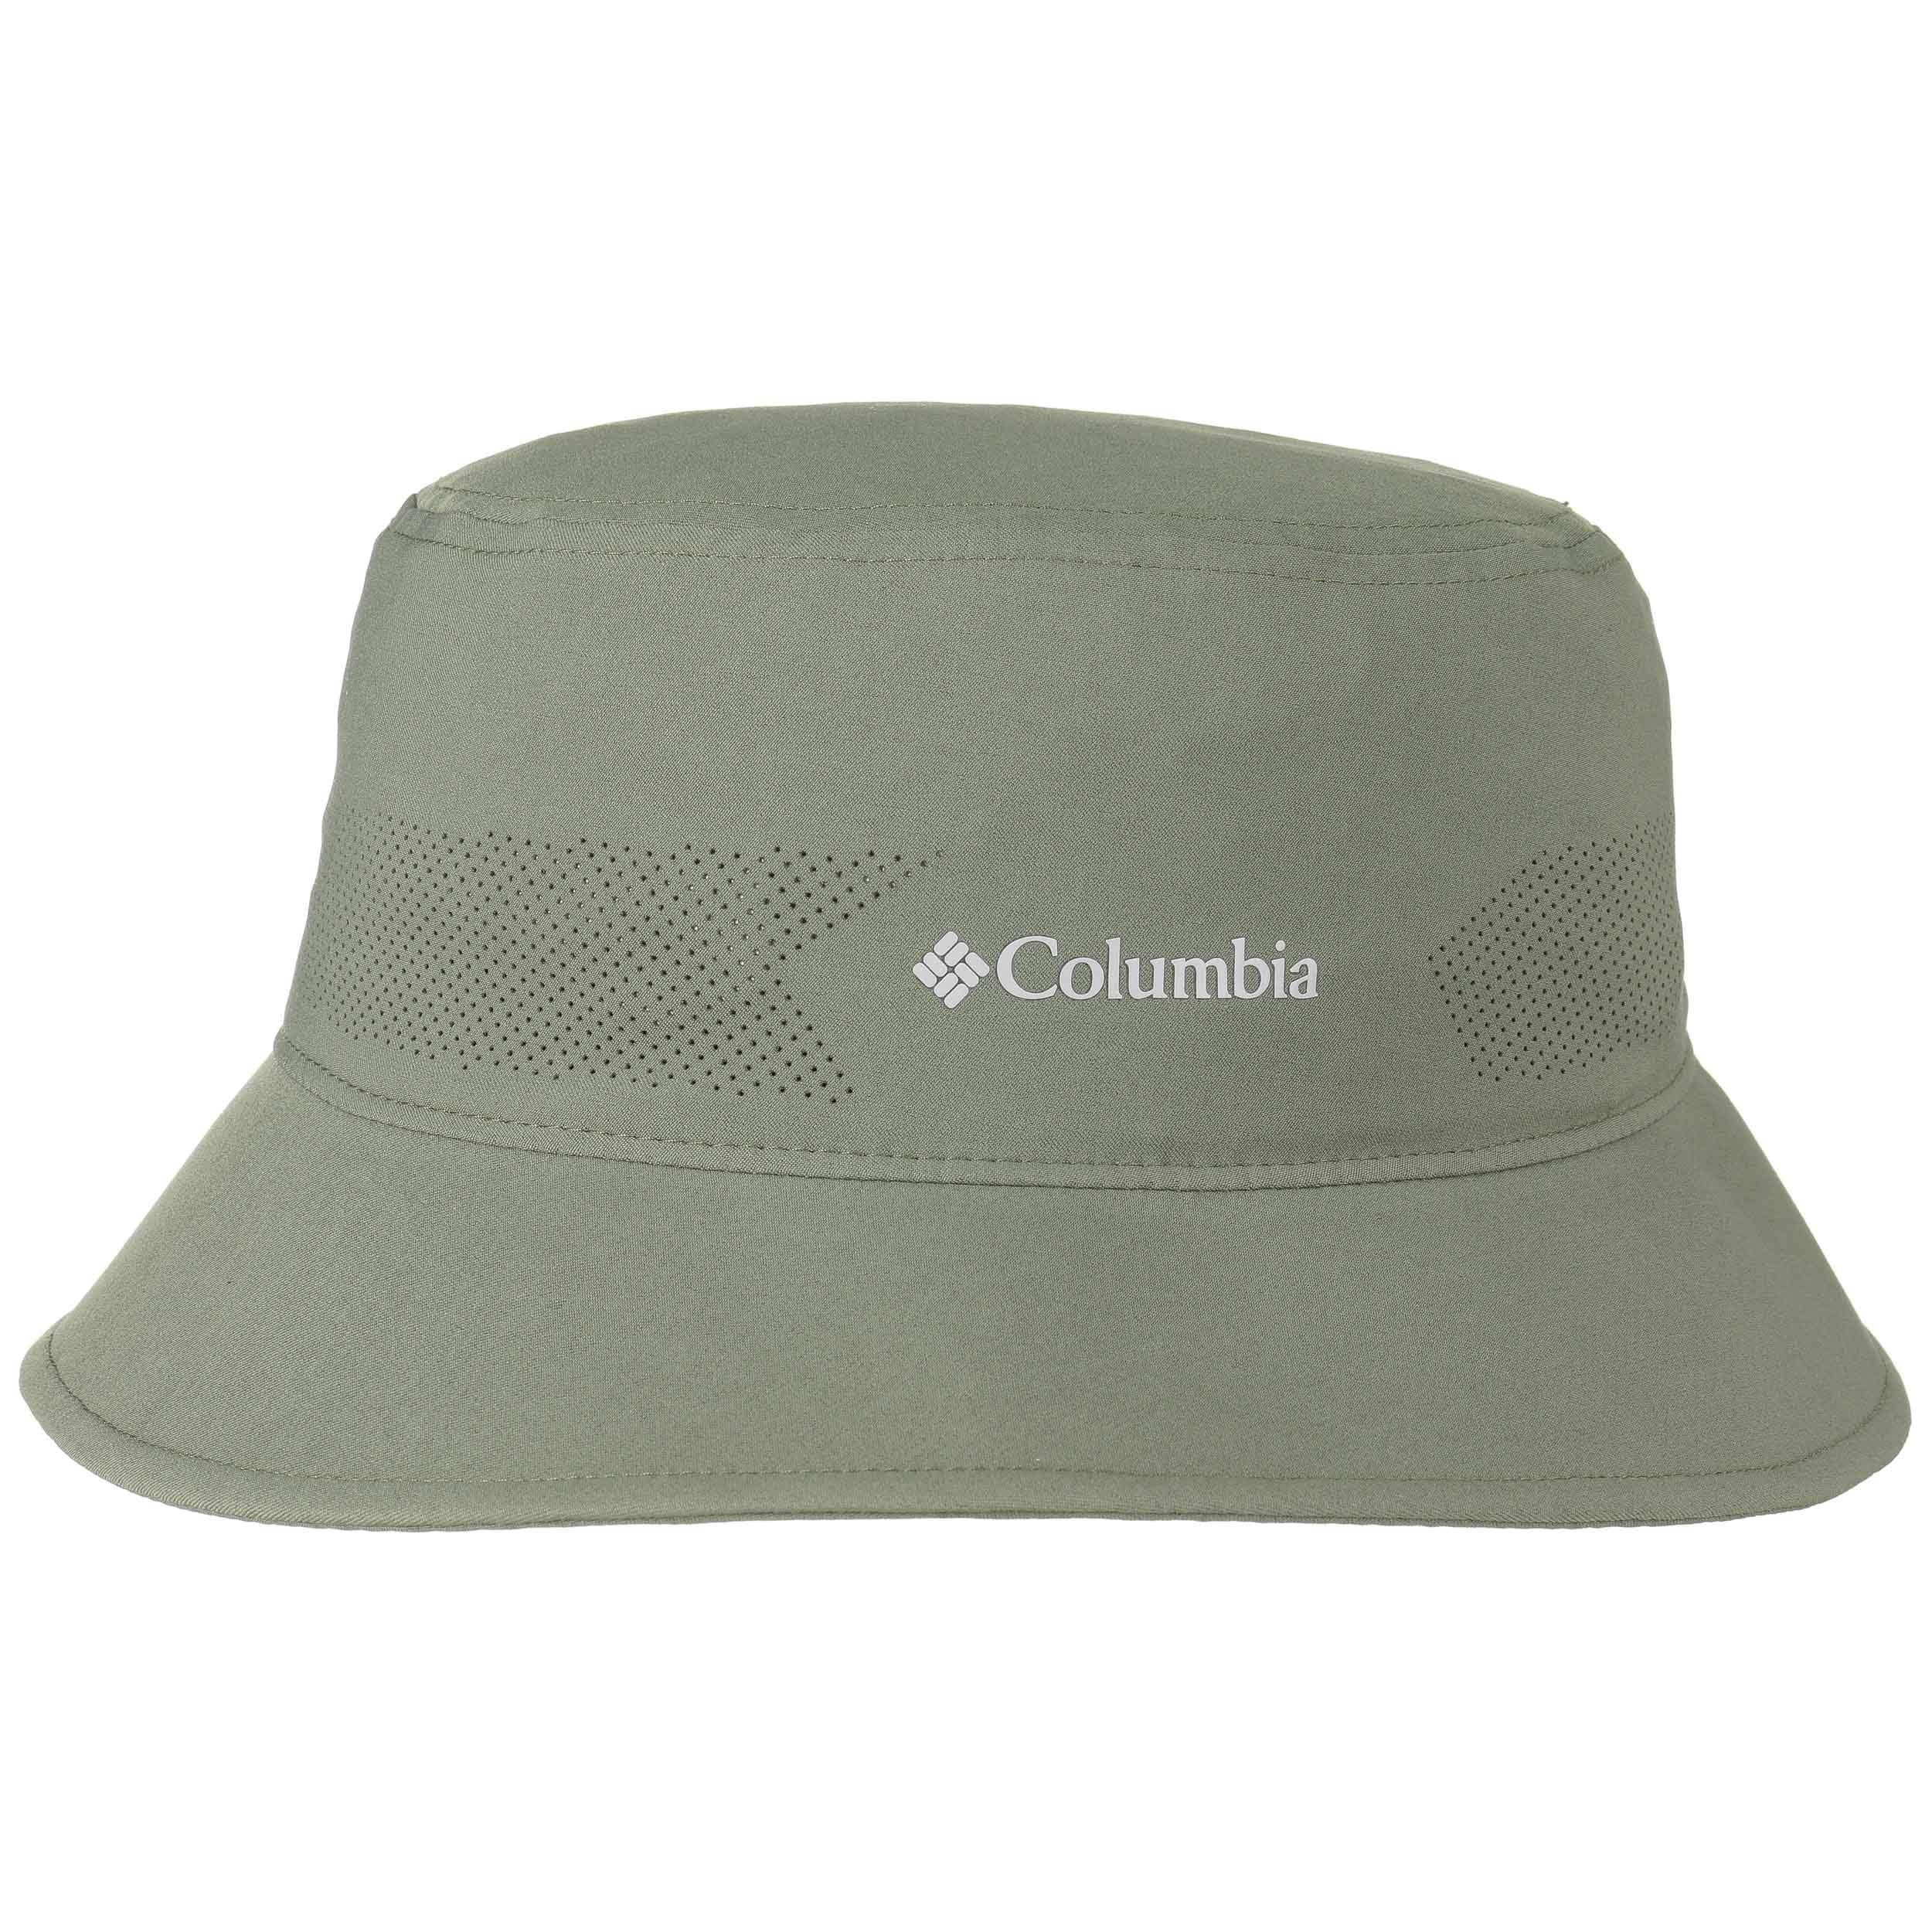 Sombrero Silver Ridge II by Columbia - Sombreros - sombreroshop.es f14123da0e7